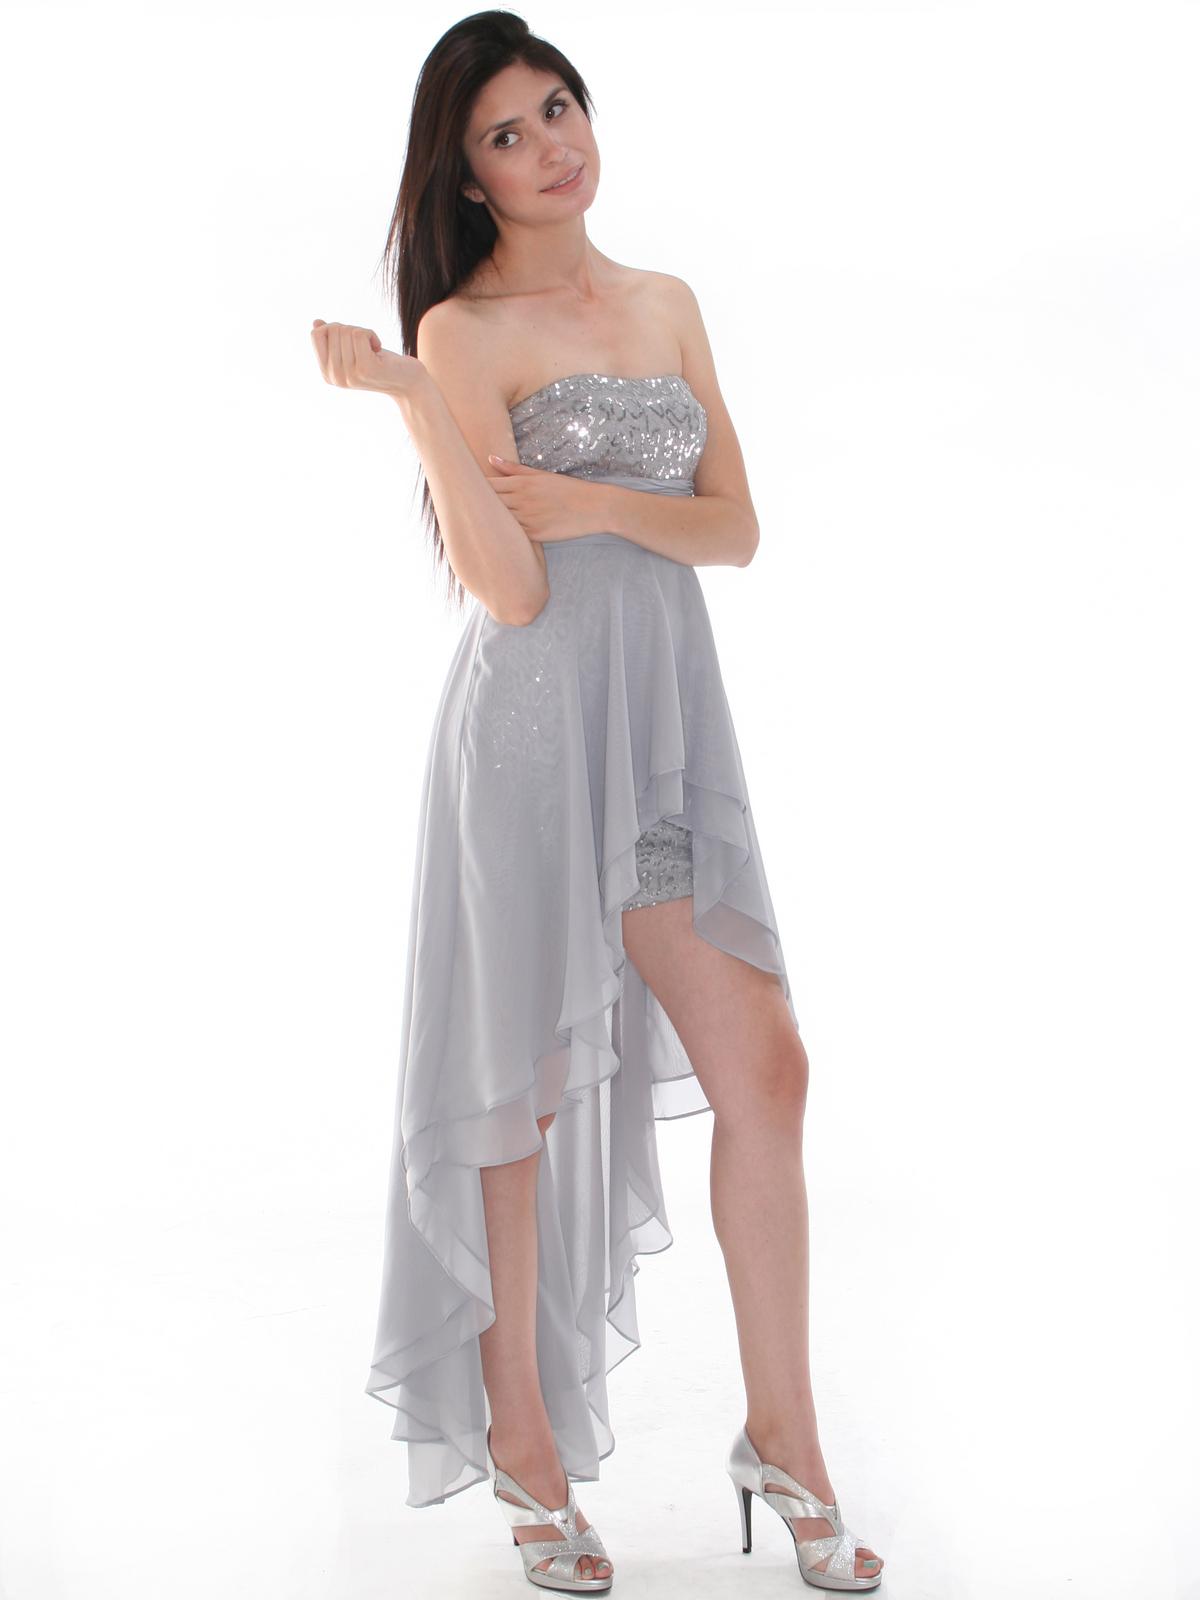 Strapless Cocktail Dresses